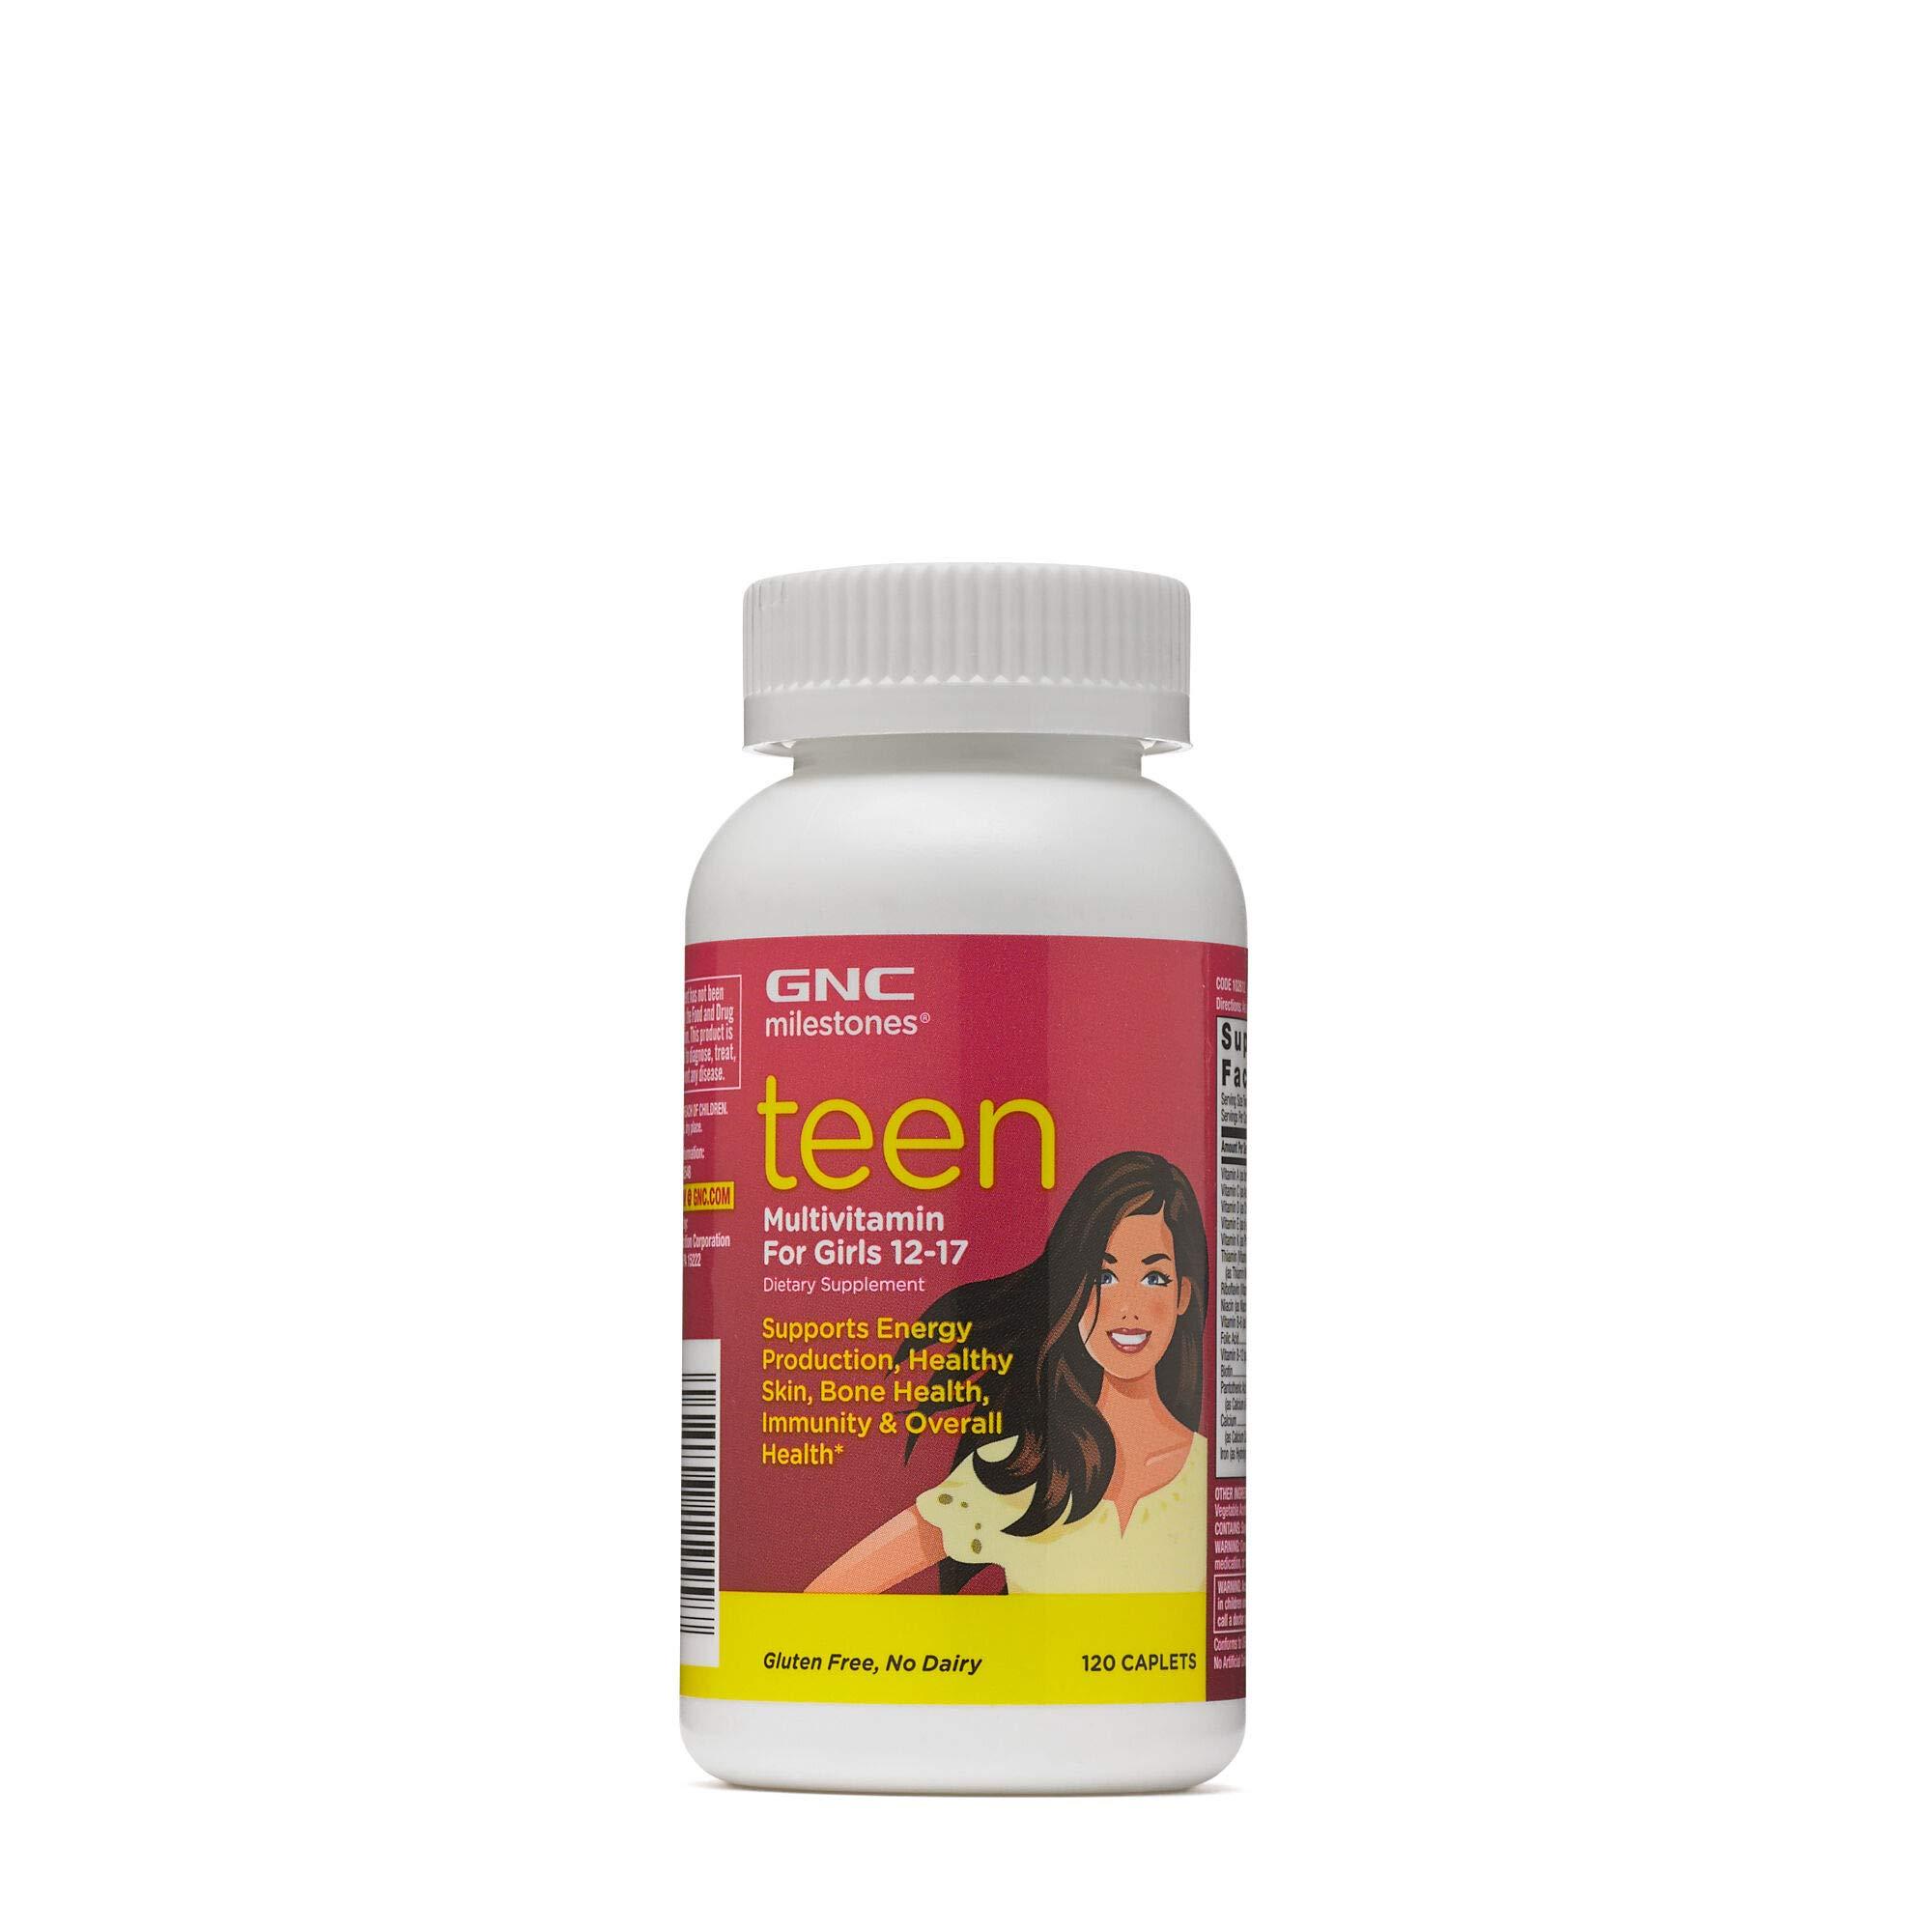 GNC milestones Teen Multivitamin Product